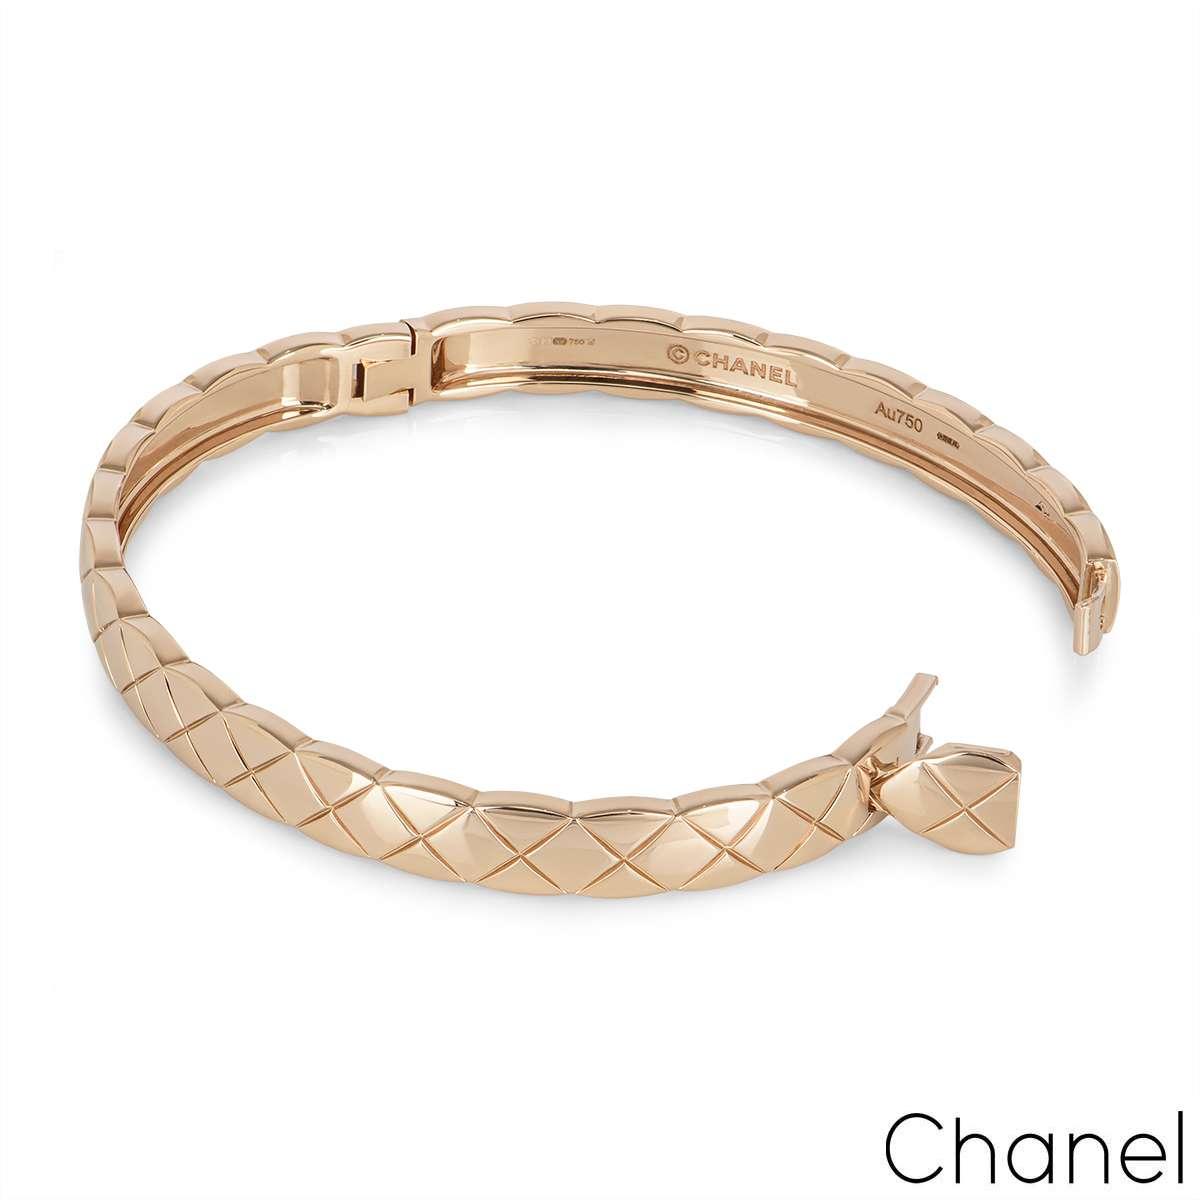 Chanel Beige / Rose Gold Coco Crush Bracelet J11333